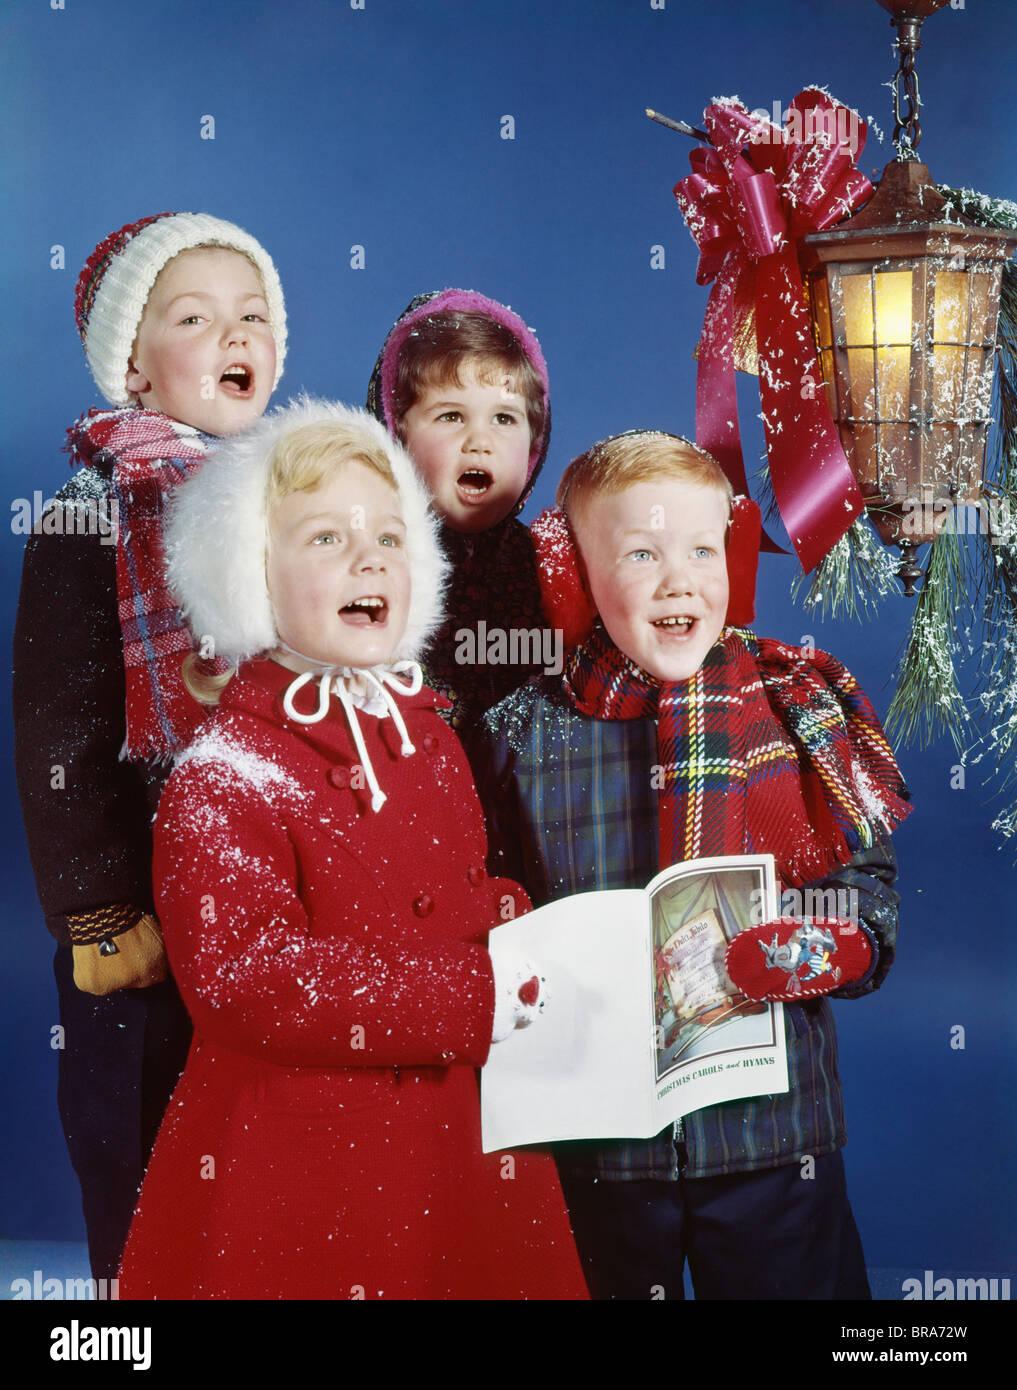 1960 1960s RETRO CHILDREN SINGING CAROLS LAMP CAROLERS CHRISTMAS - Stock Image